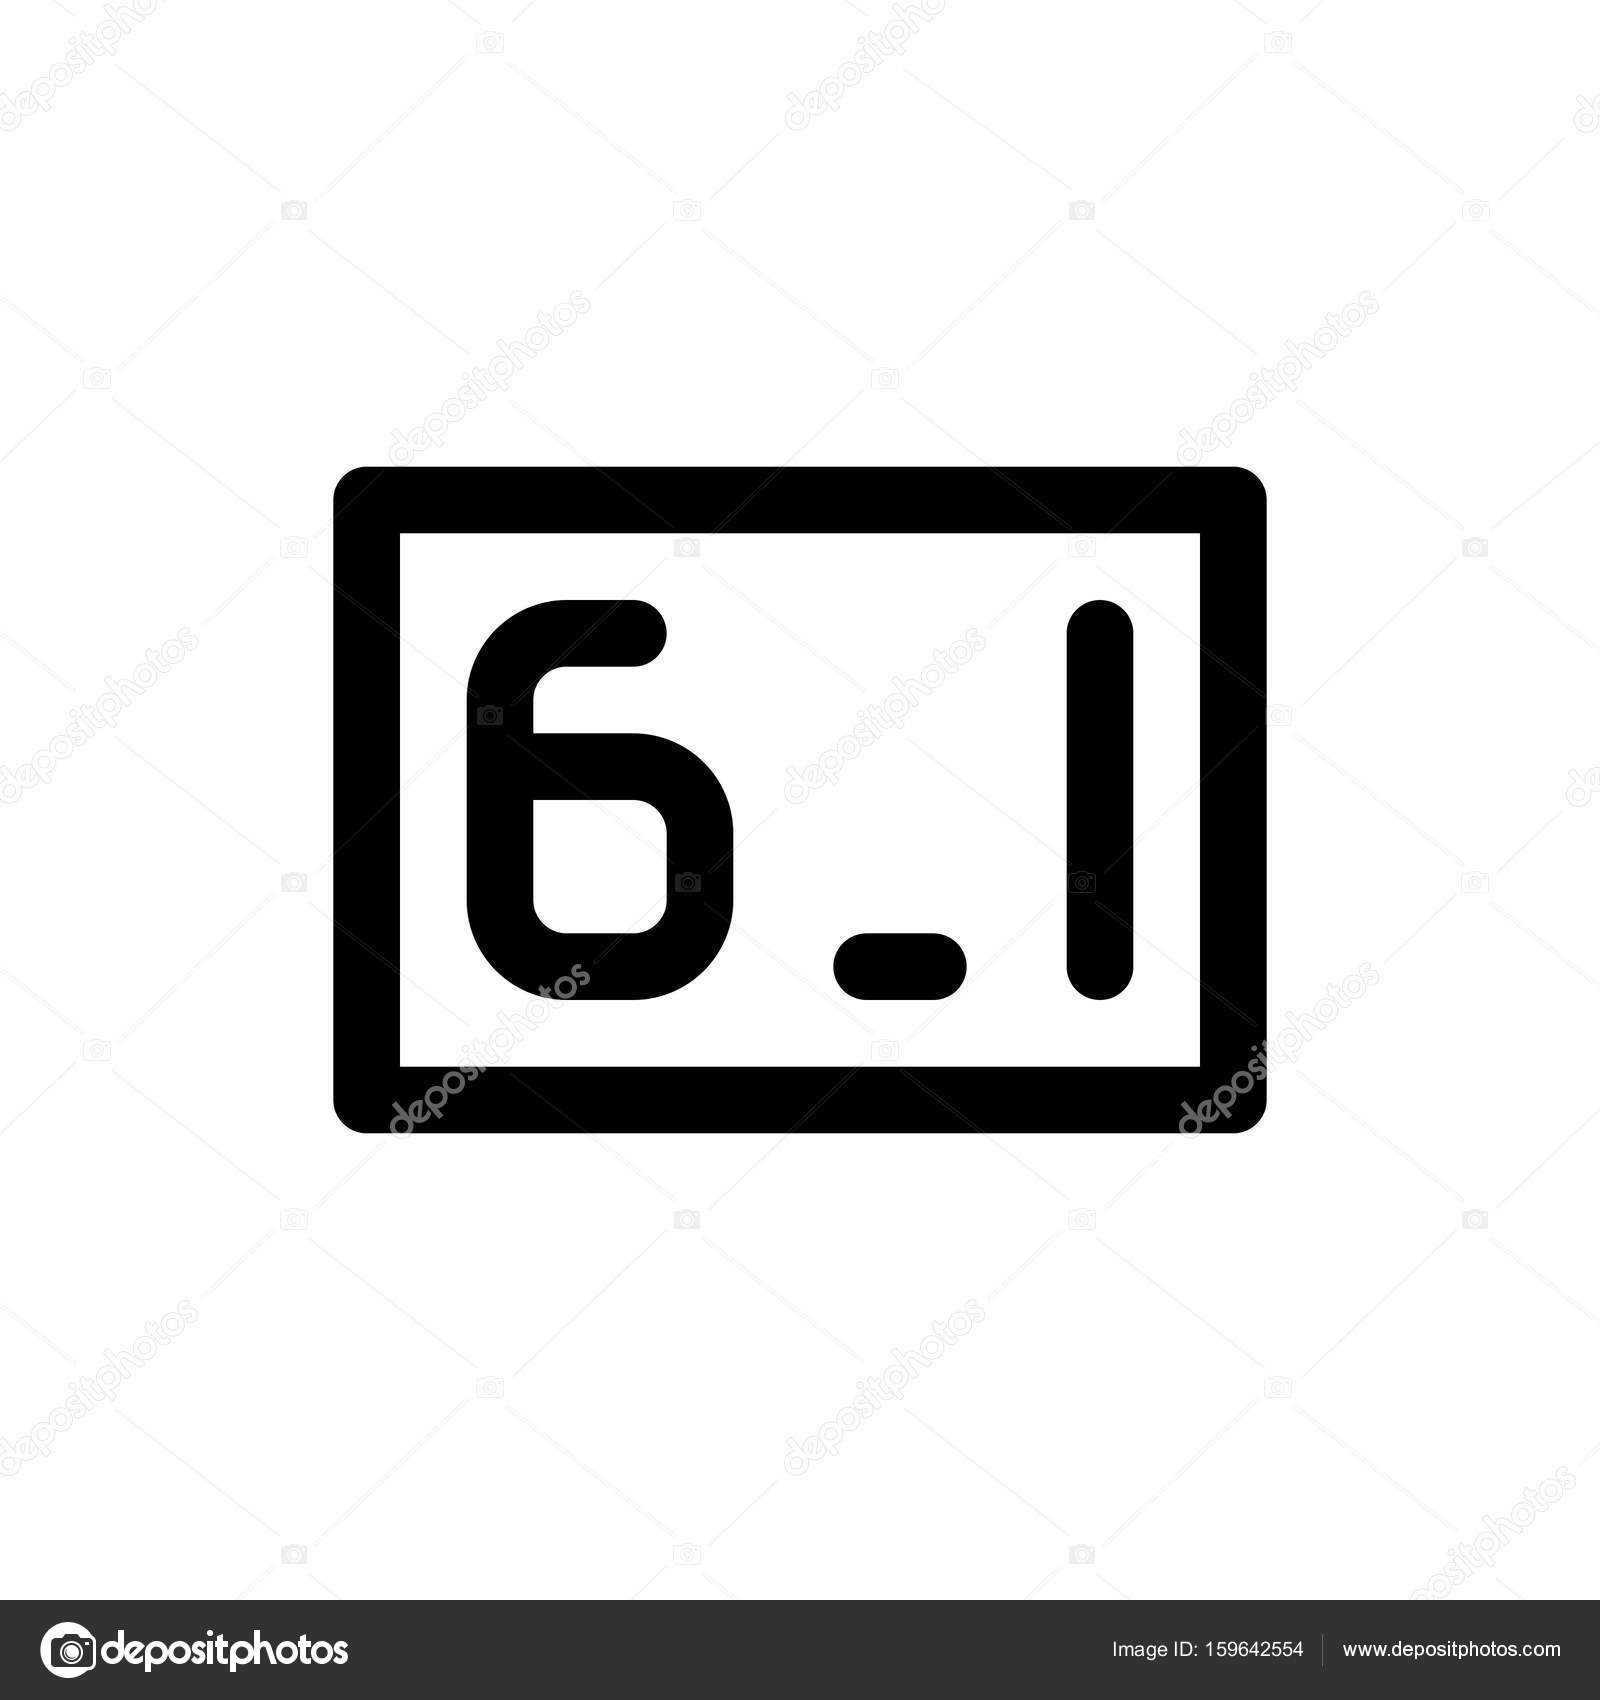 dolby digital logo stock vector get4net 159642554 rh depositphotos com dolby digital logo svg dolby digital logo 2011